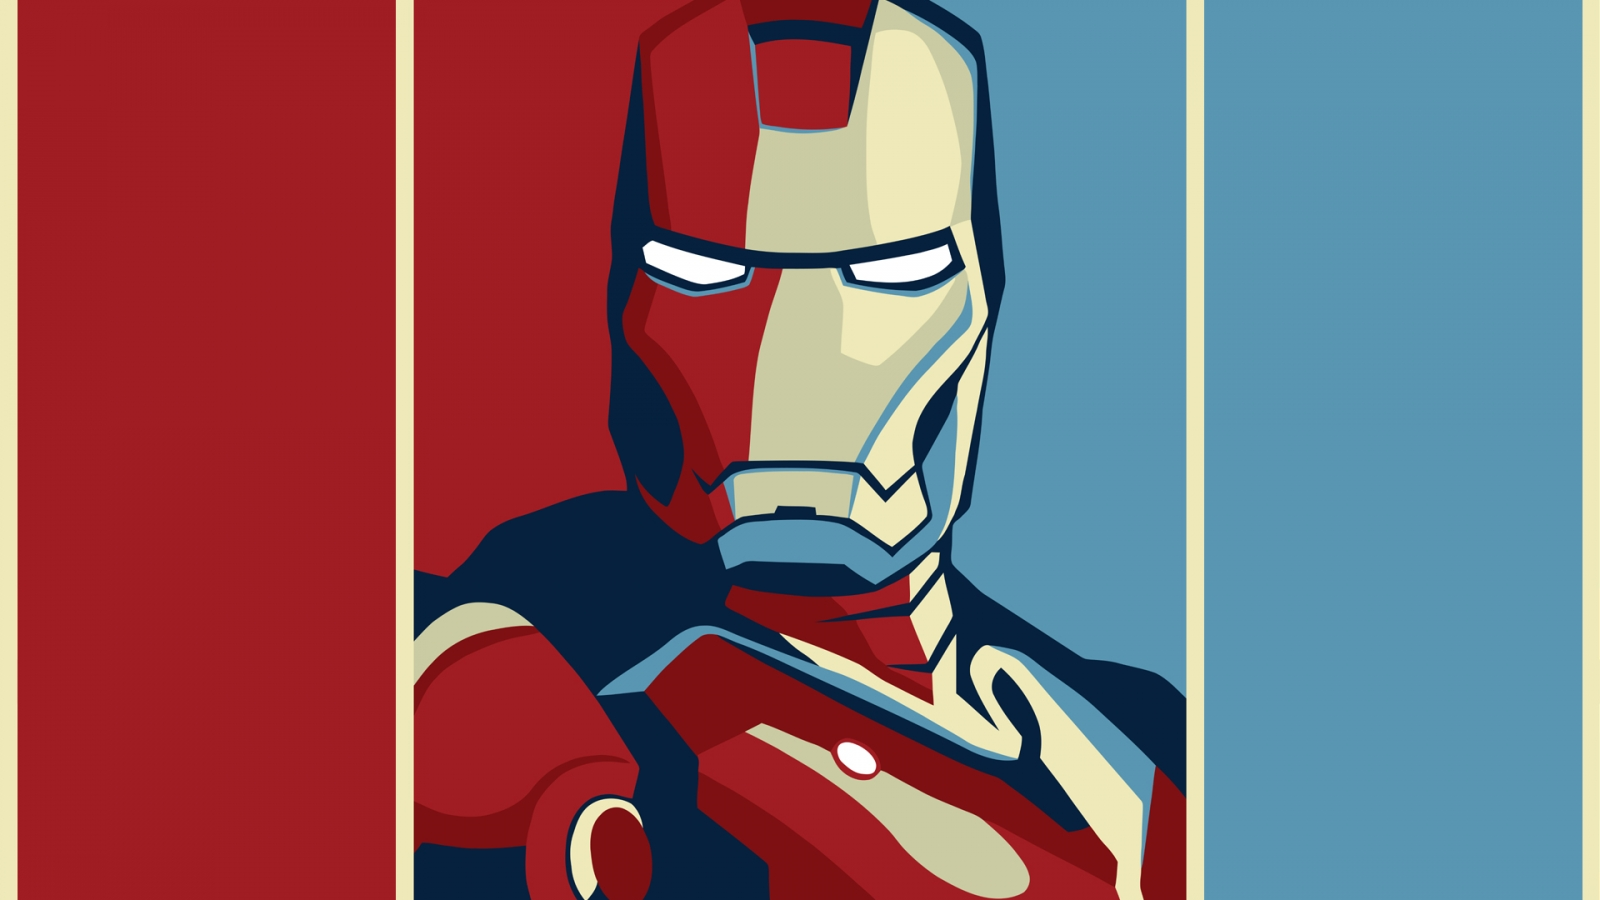 Dibujo de Iron Man - 1600x900